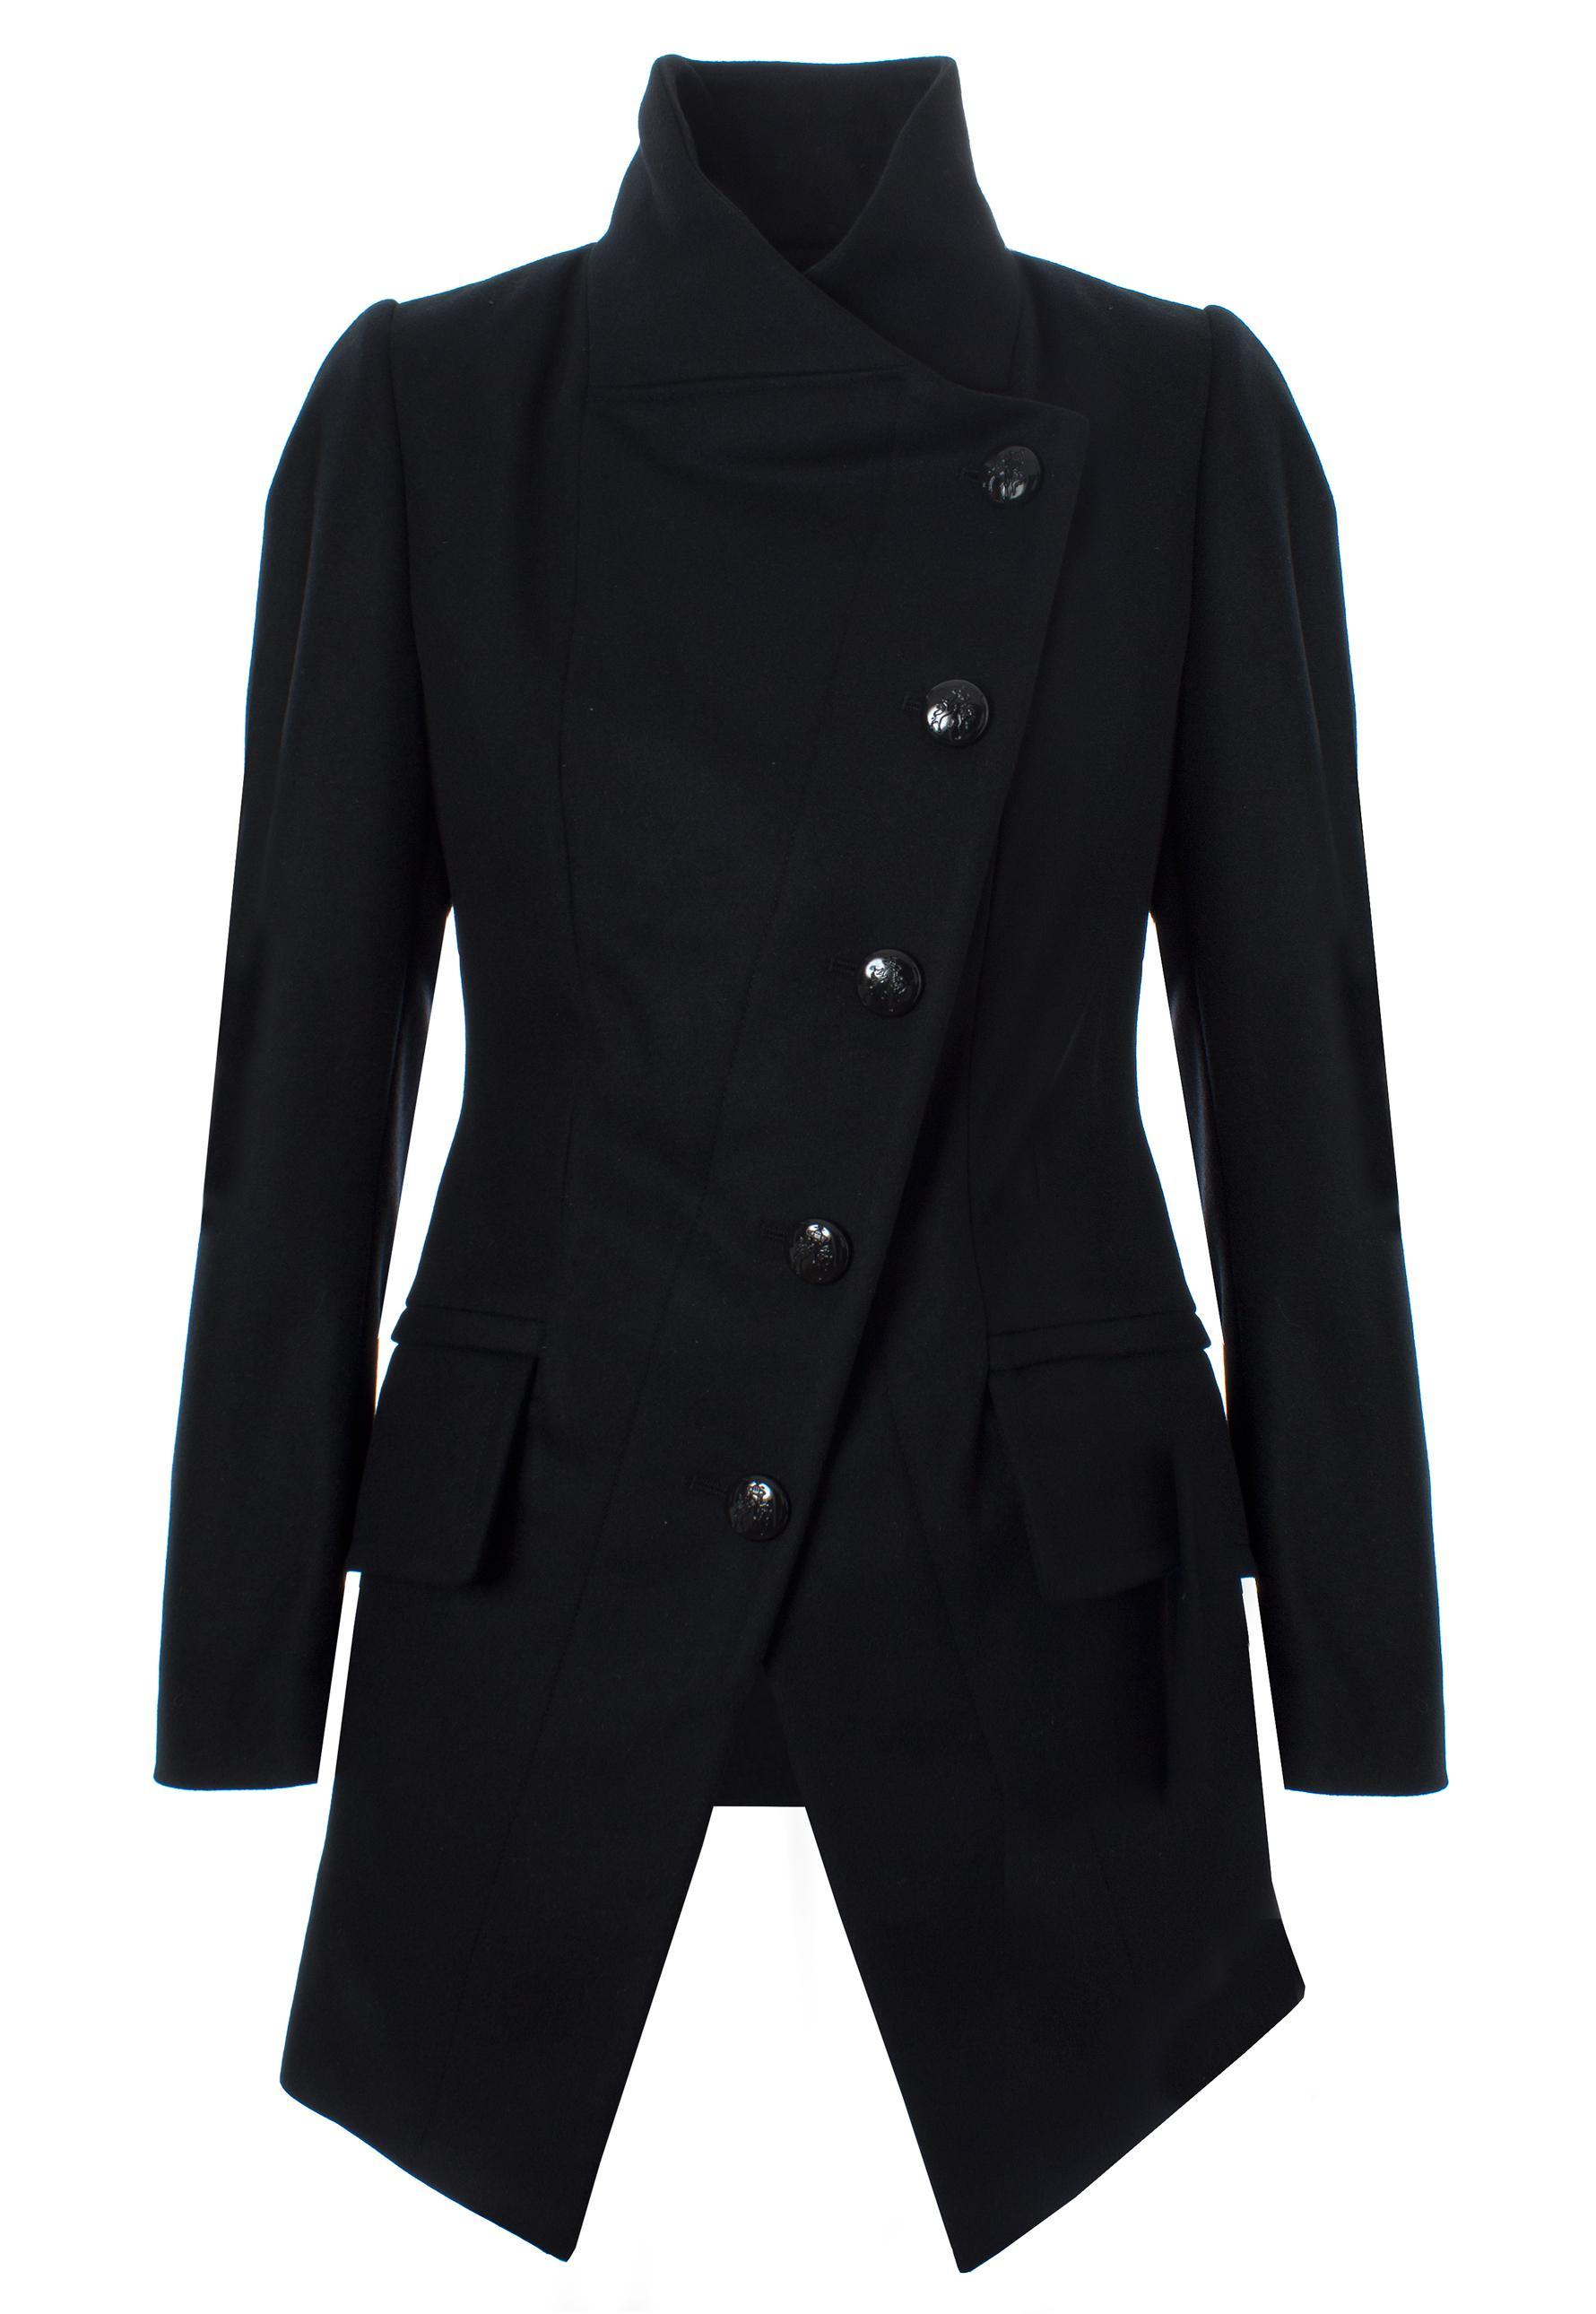 Lyst - Vivienne Westwood Anglomania State Coat Black in Black 2ca750b09